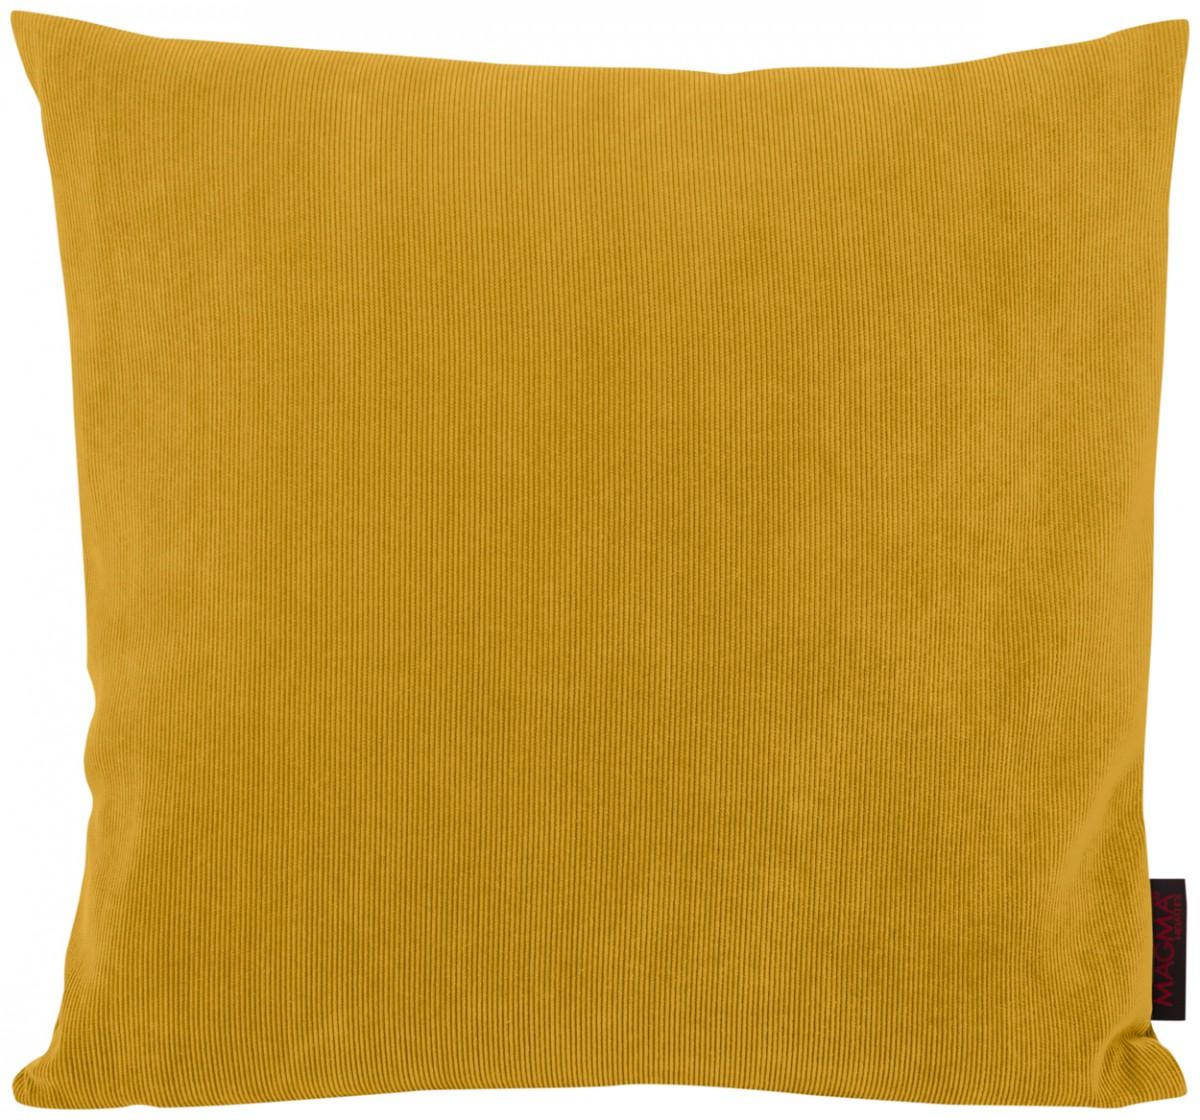 kissenh lle kissen trio 40x40cm goldfarben gelb ebay. Black Bedroom Furniture Sets. Home Design Ideas